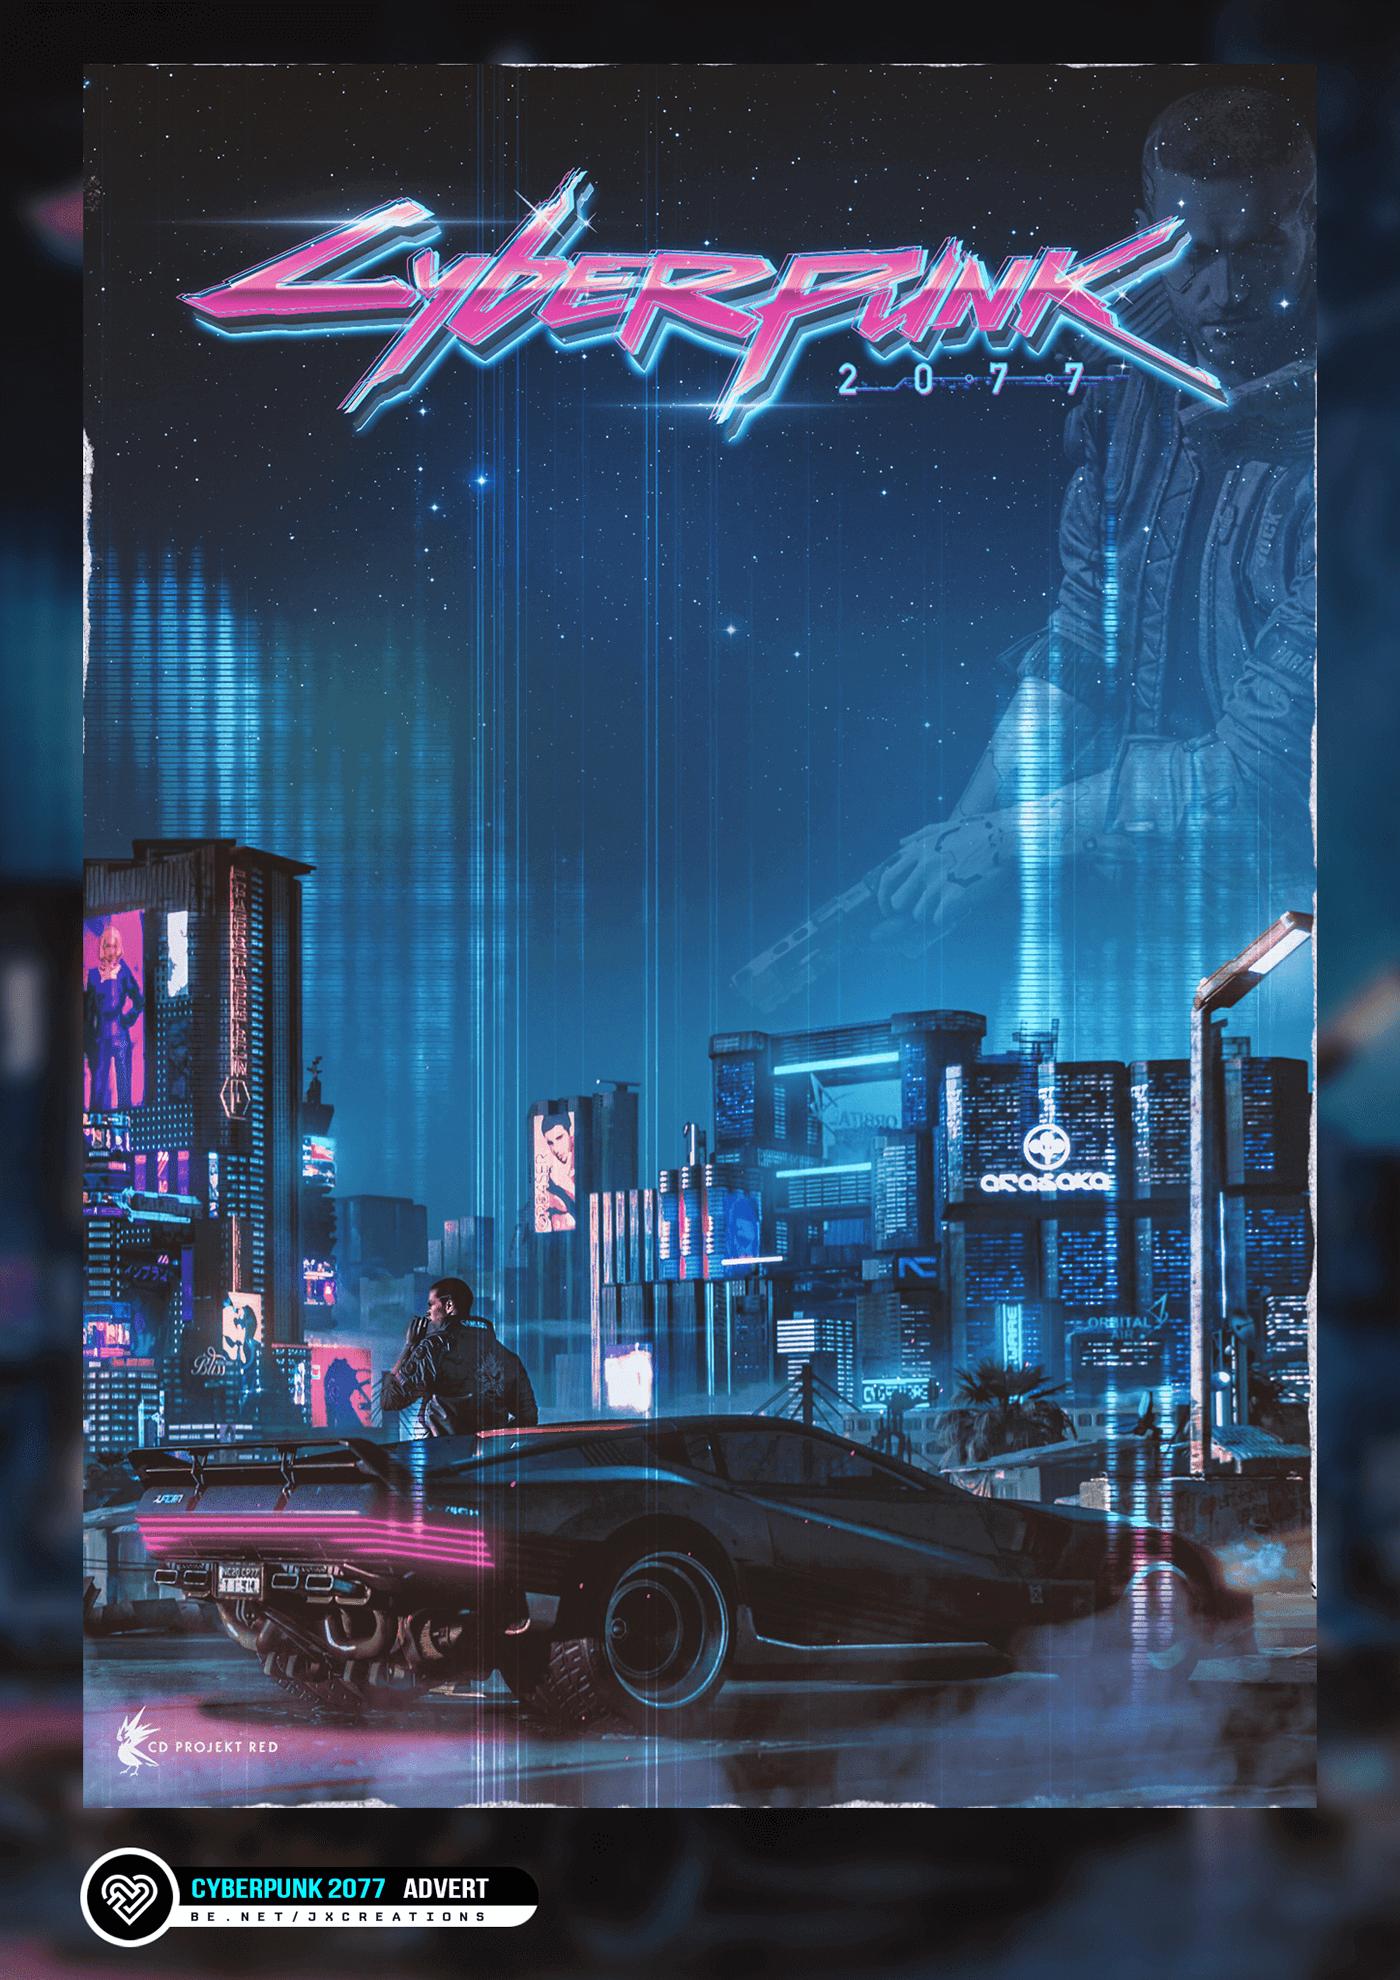 Jasmine Ford – Cyberpunk 2077